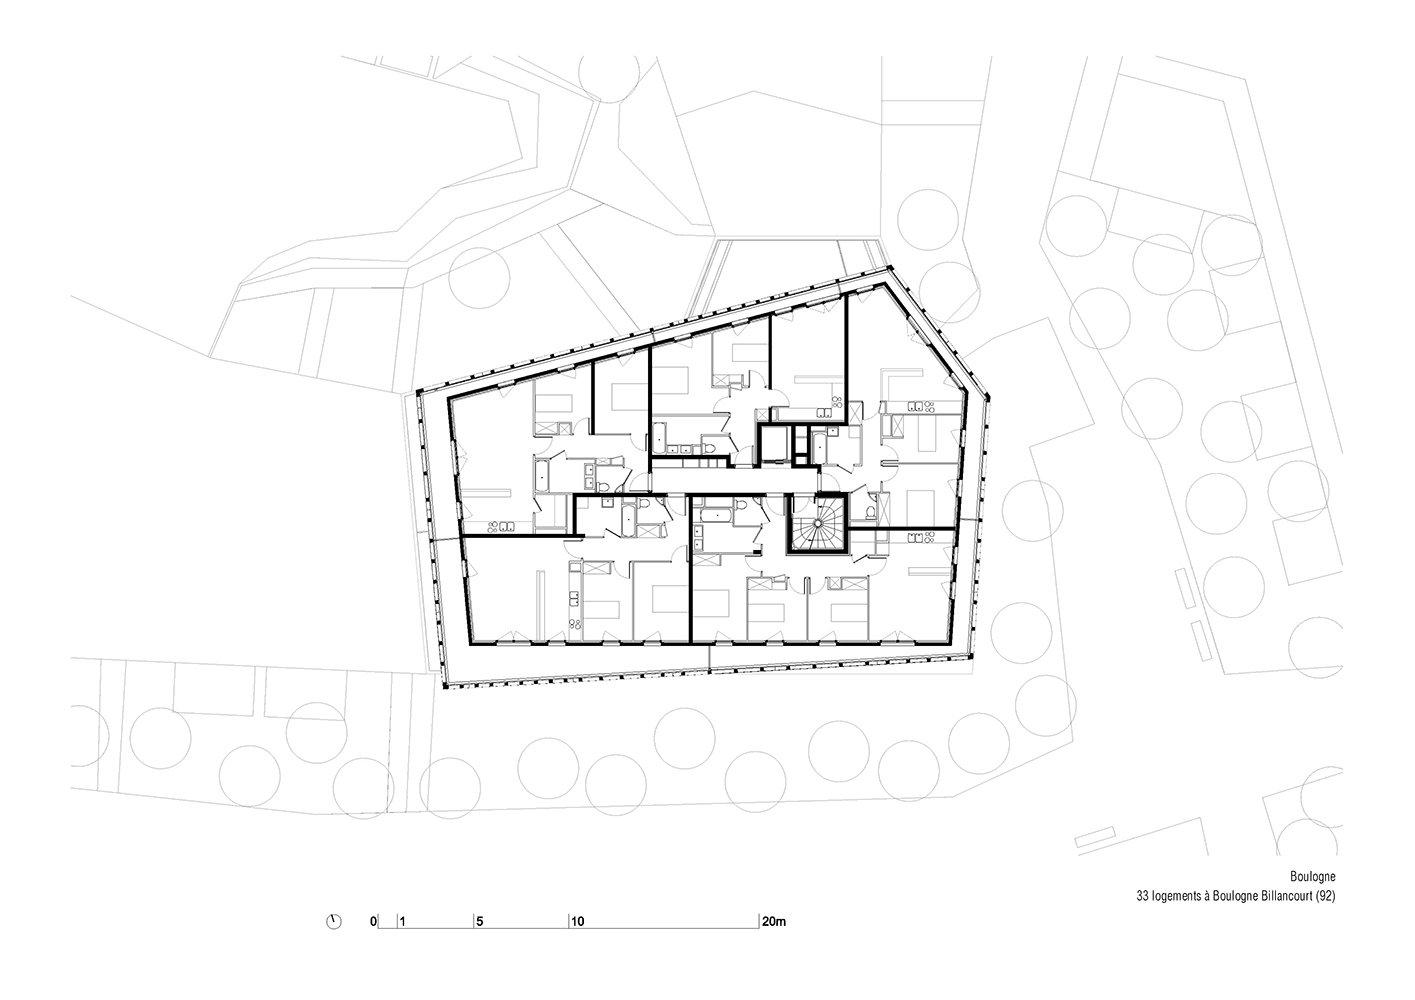 Arches Boulogne - Plan Nivel 4 }